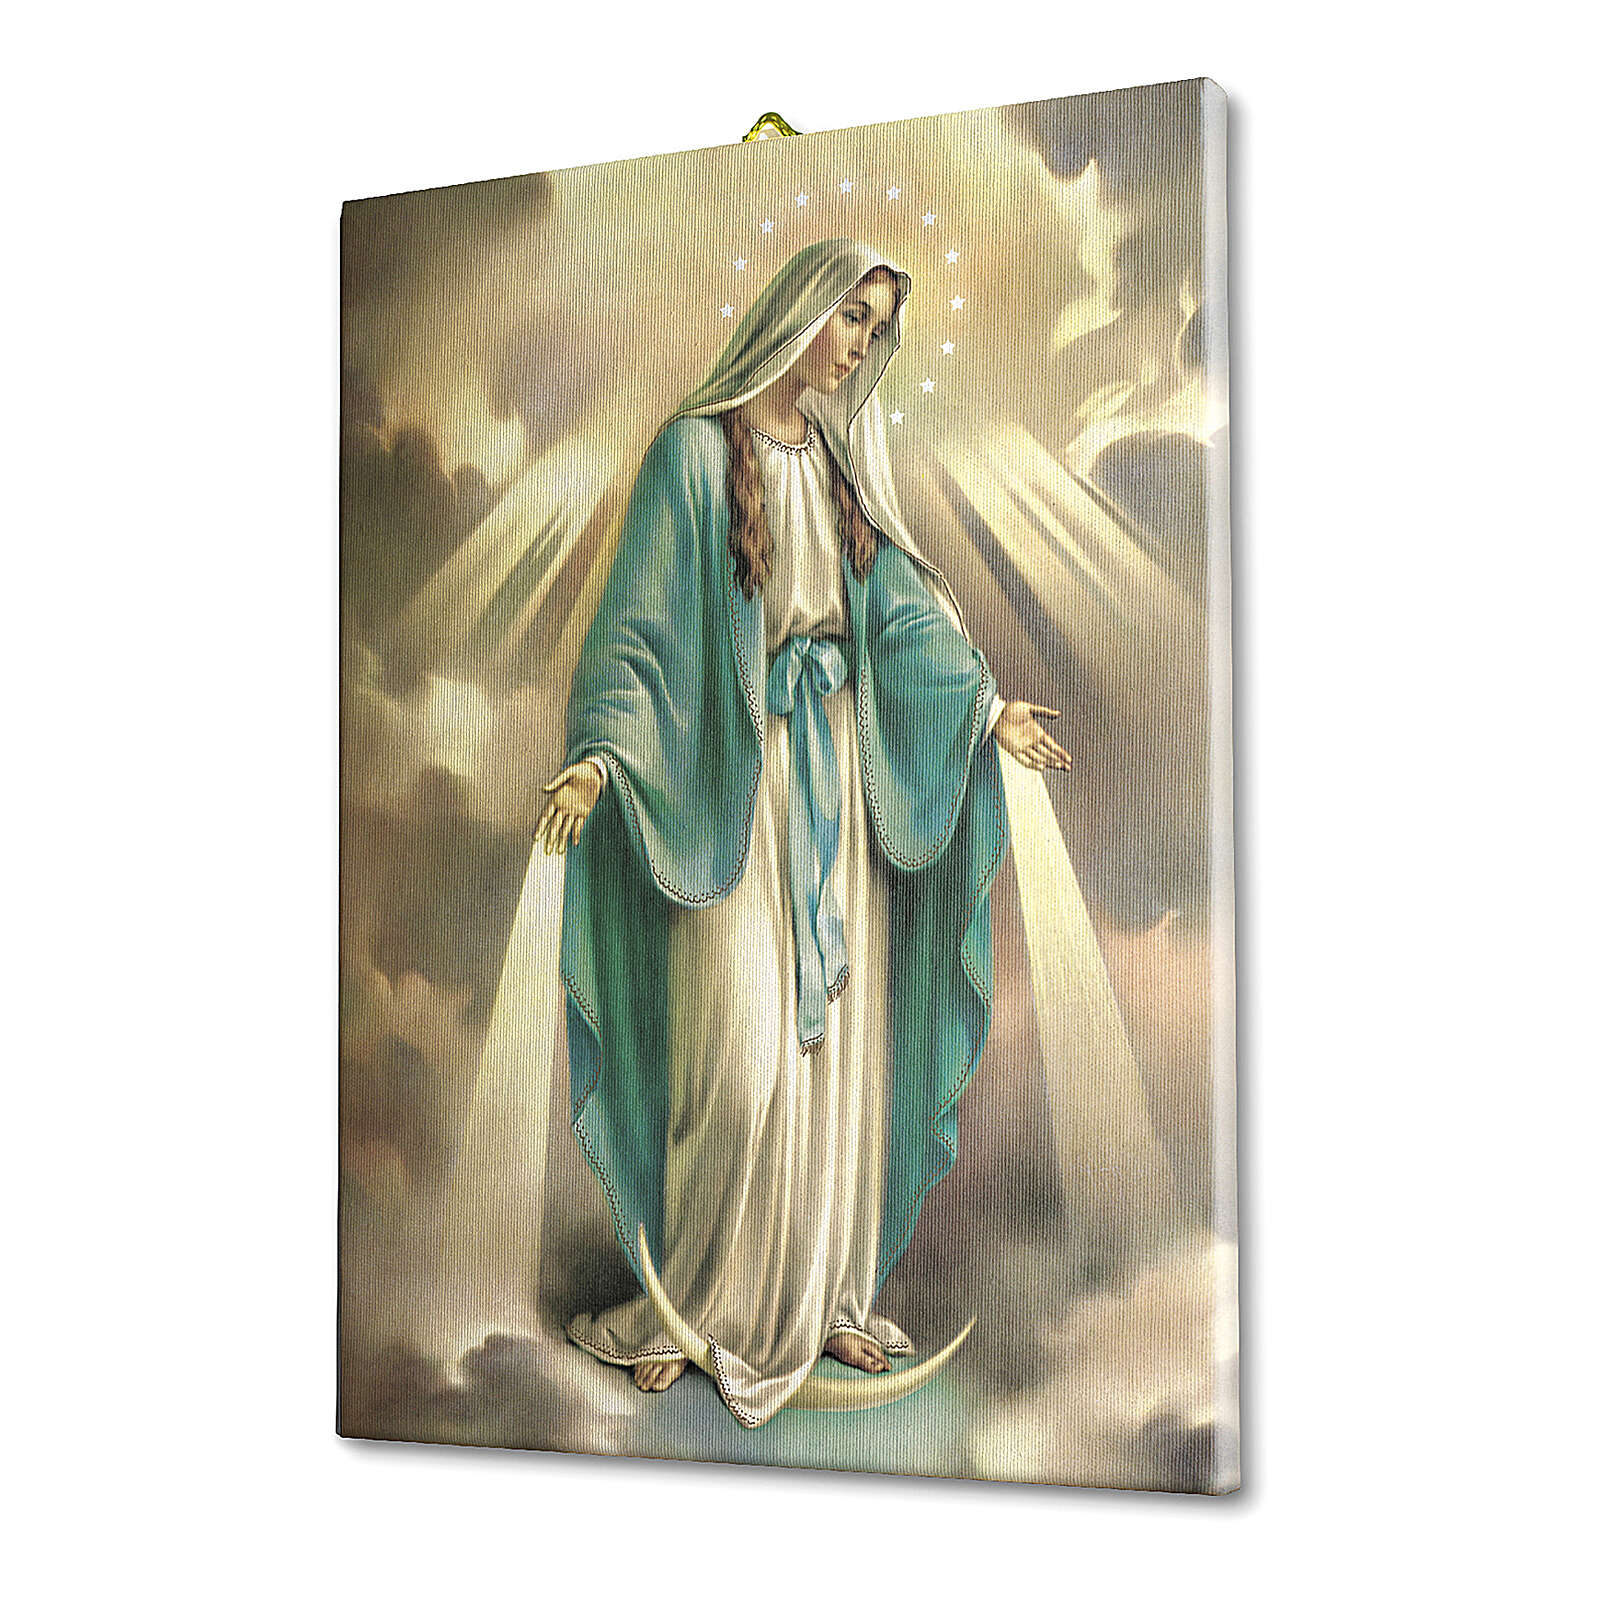 Quadro tela Nossa Senhora da Medalha Milagrosa 25x20 cm 3